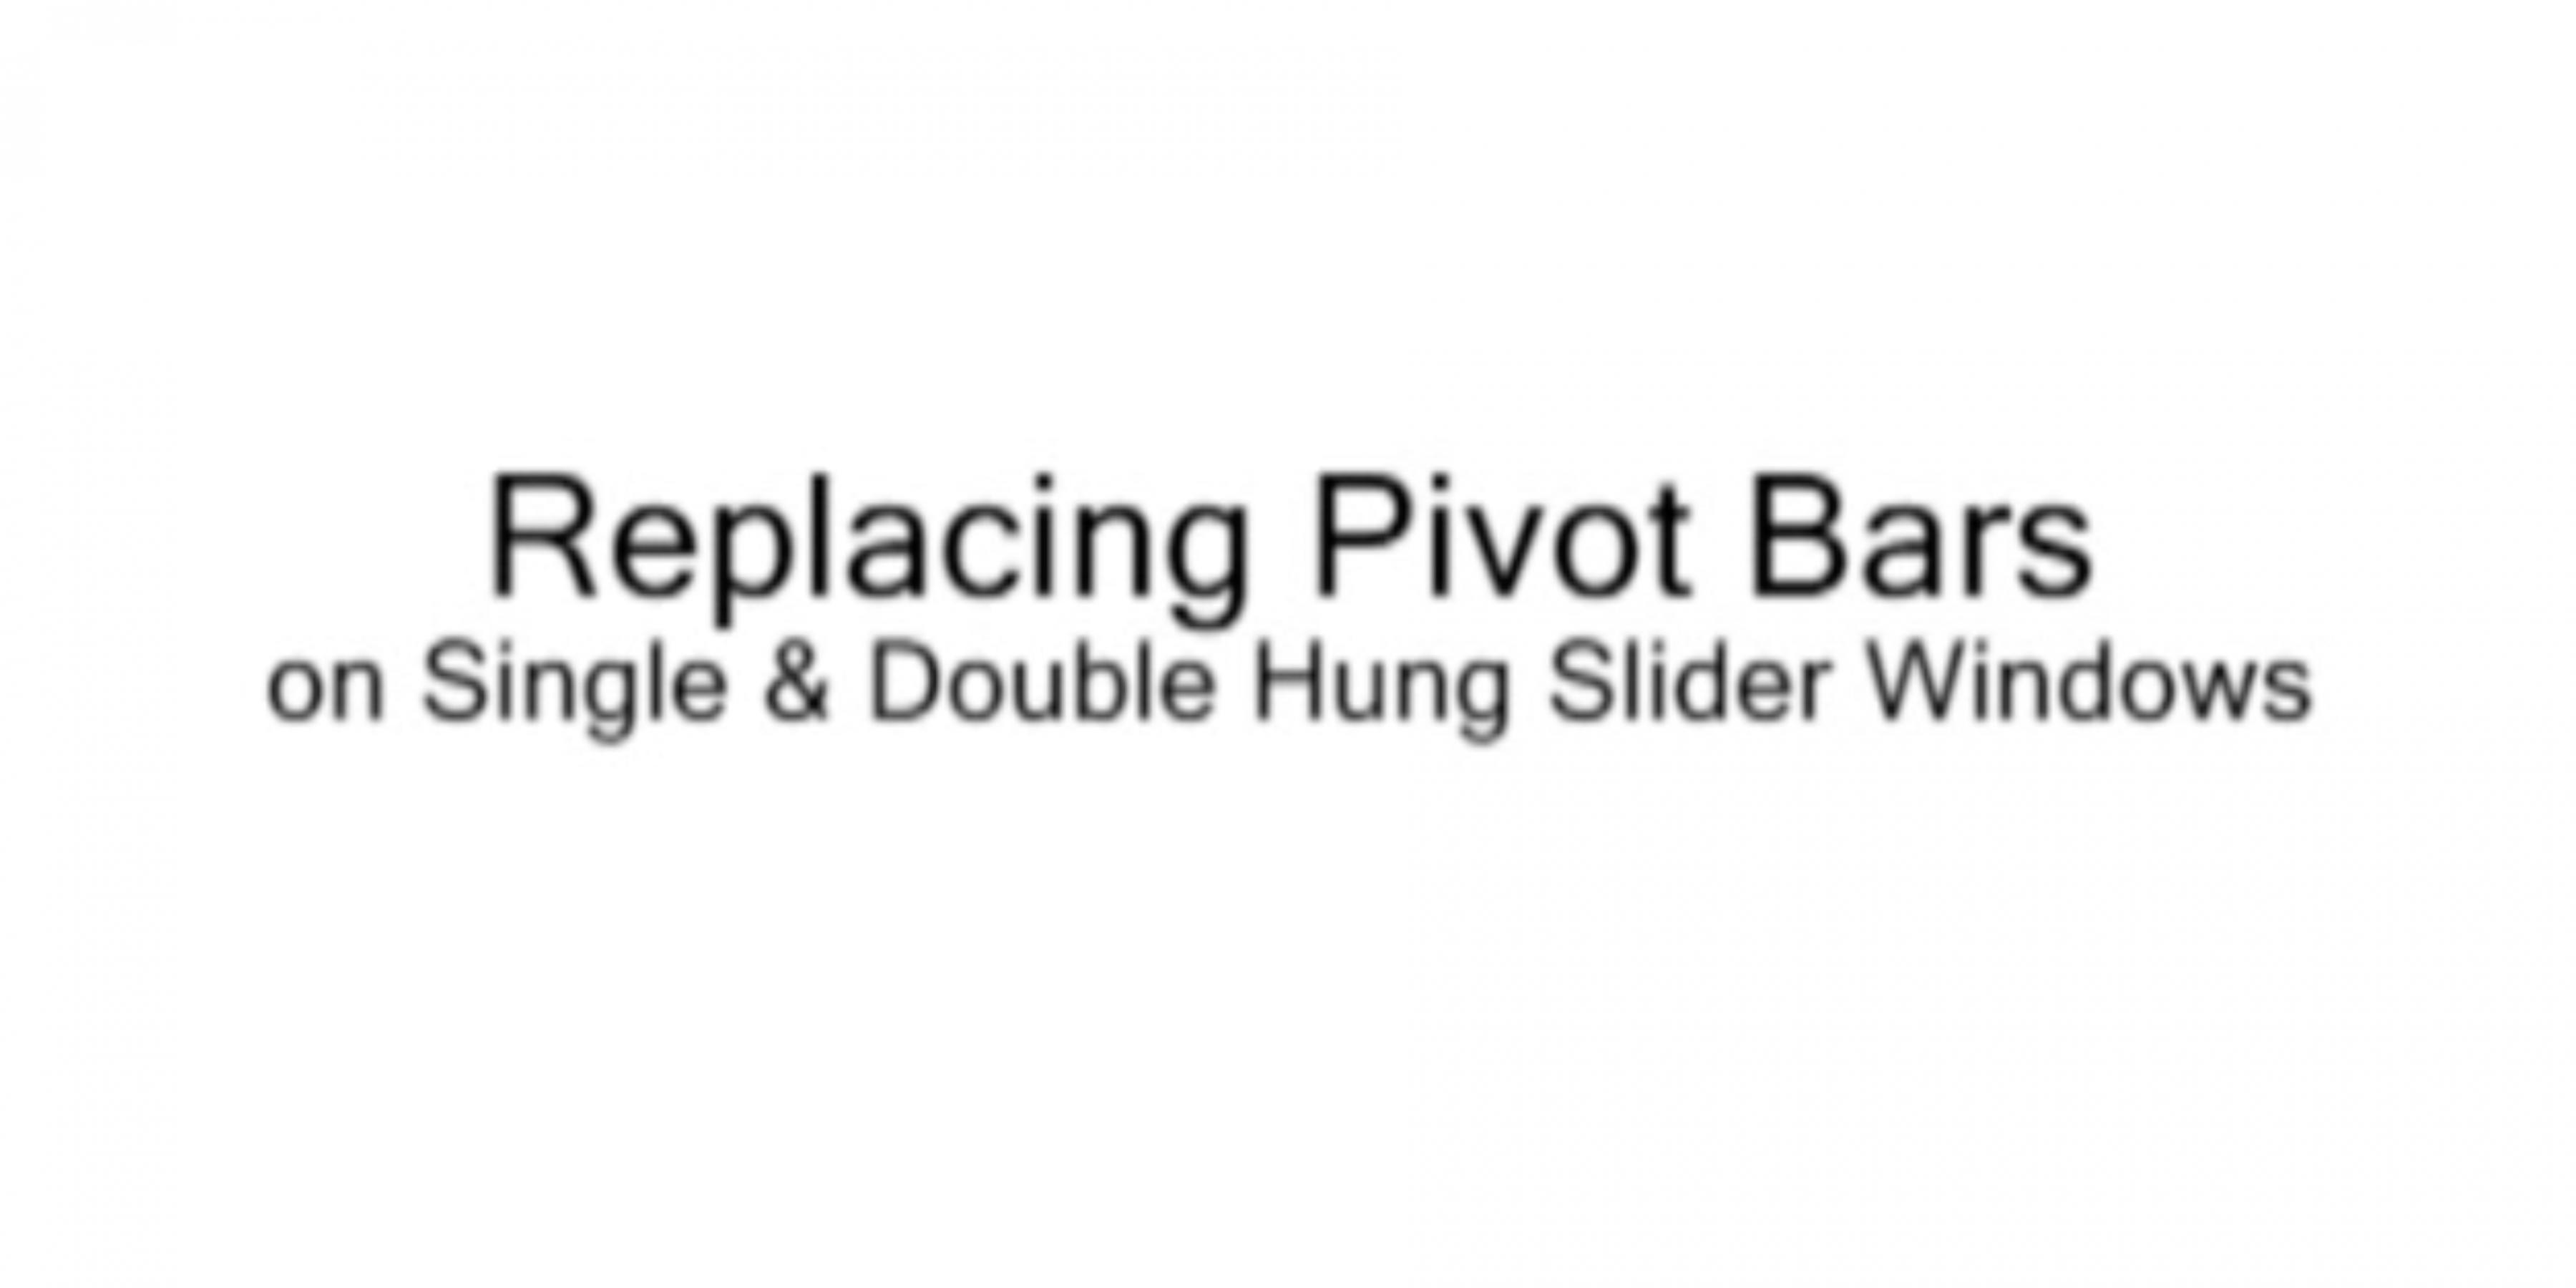 Replacing Pivot Bars